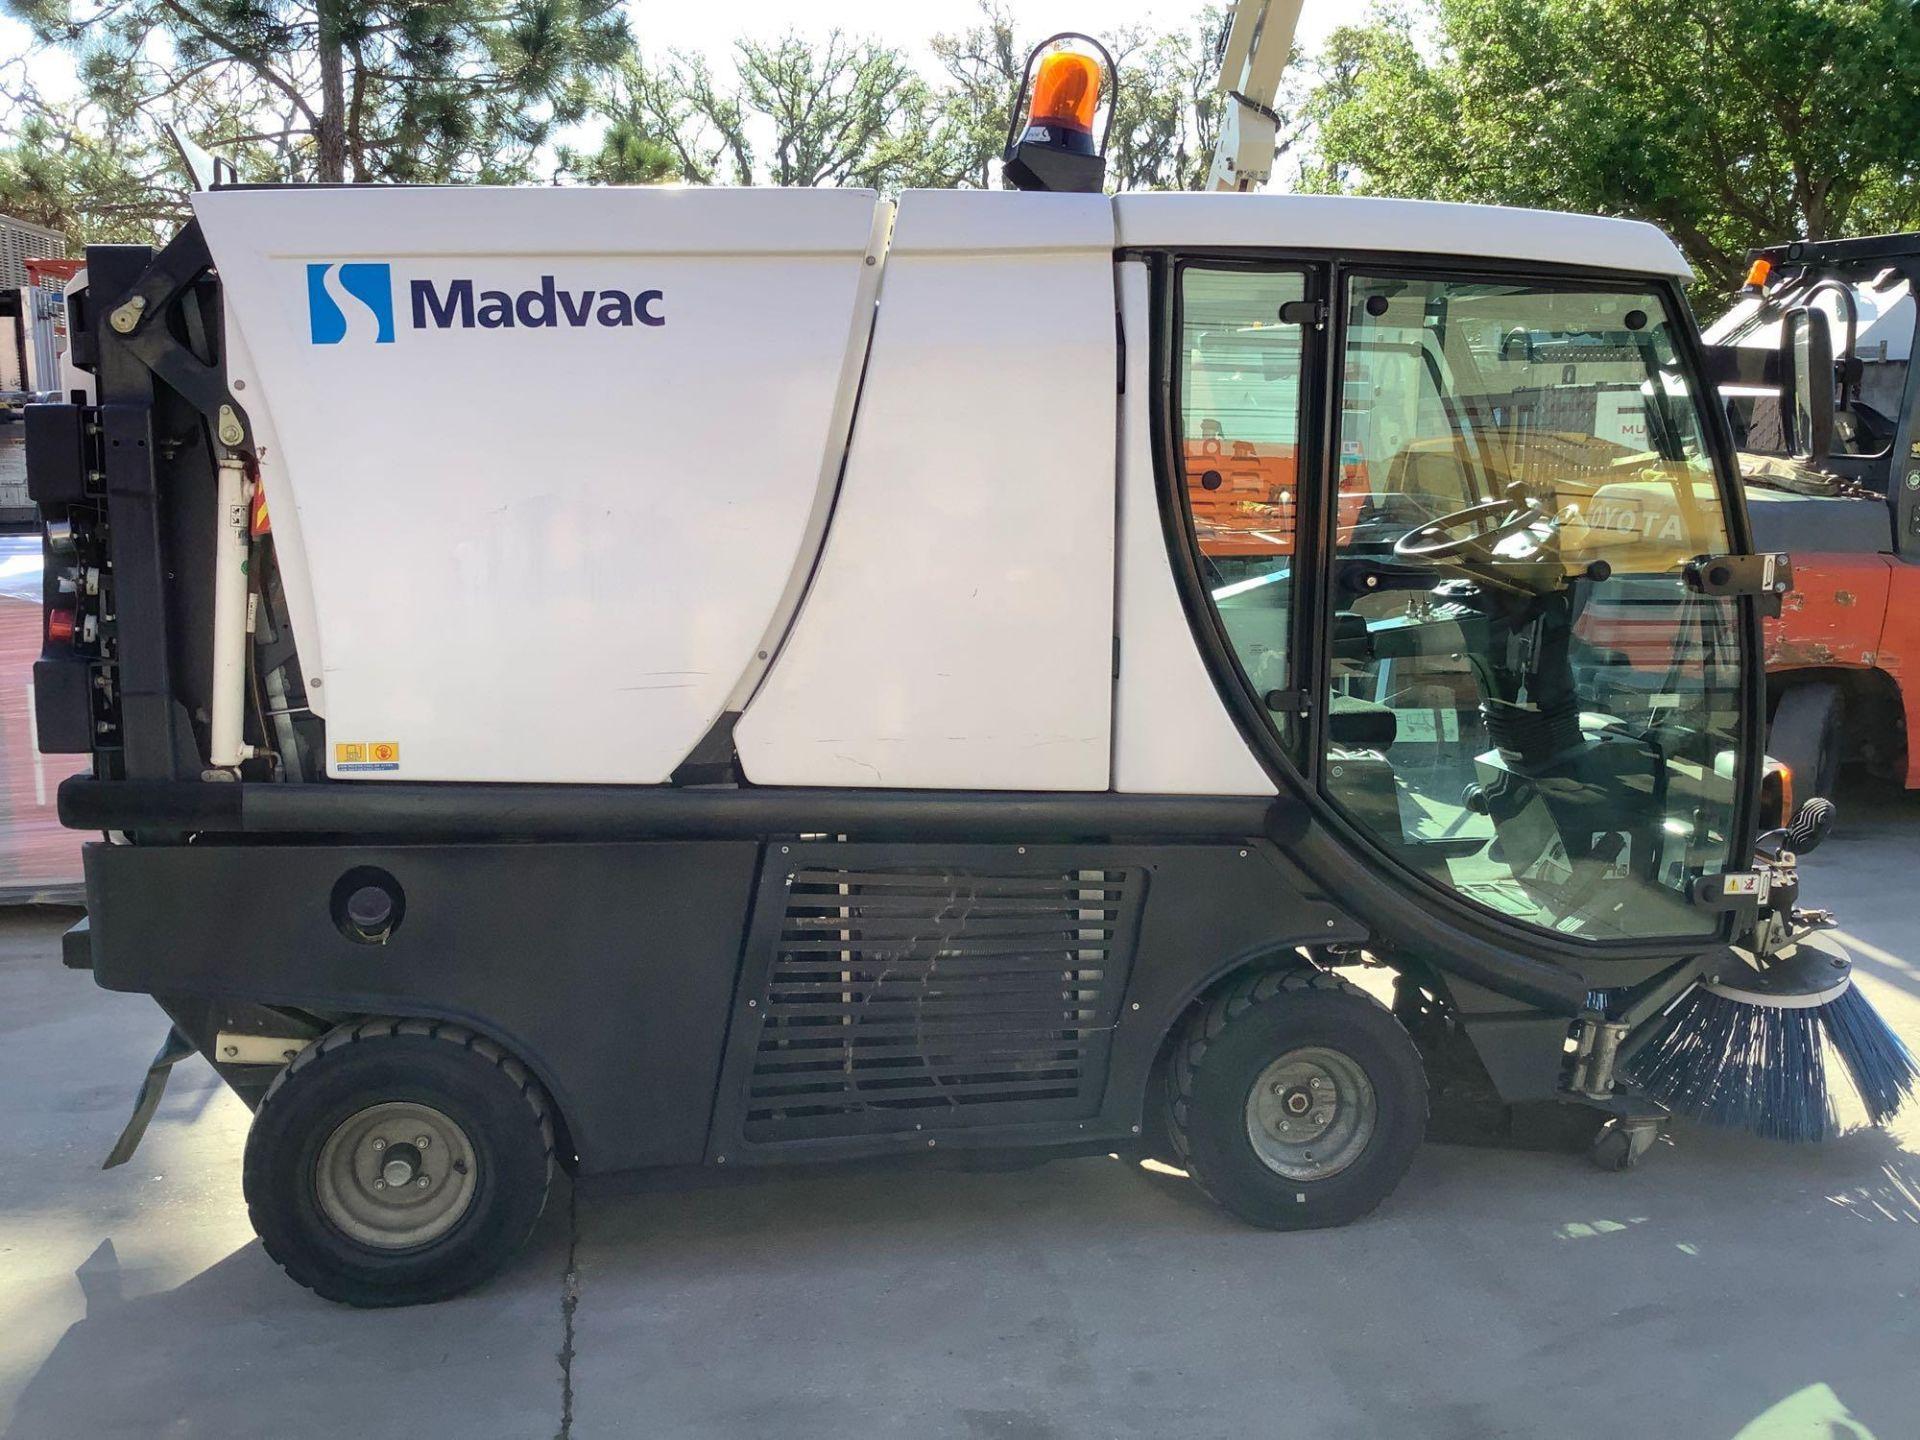 MADVAC COMPACT SWEEPER MODEL LS100 ,ENCLOSED CAB,BACK UP CAMERA, A/C AIR, EXTRA KEY - Image 7 of 15